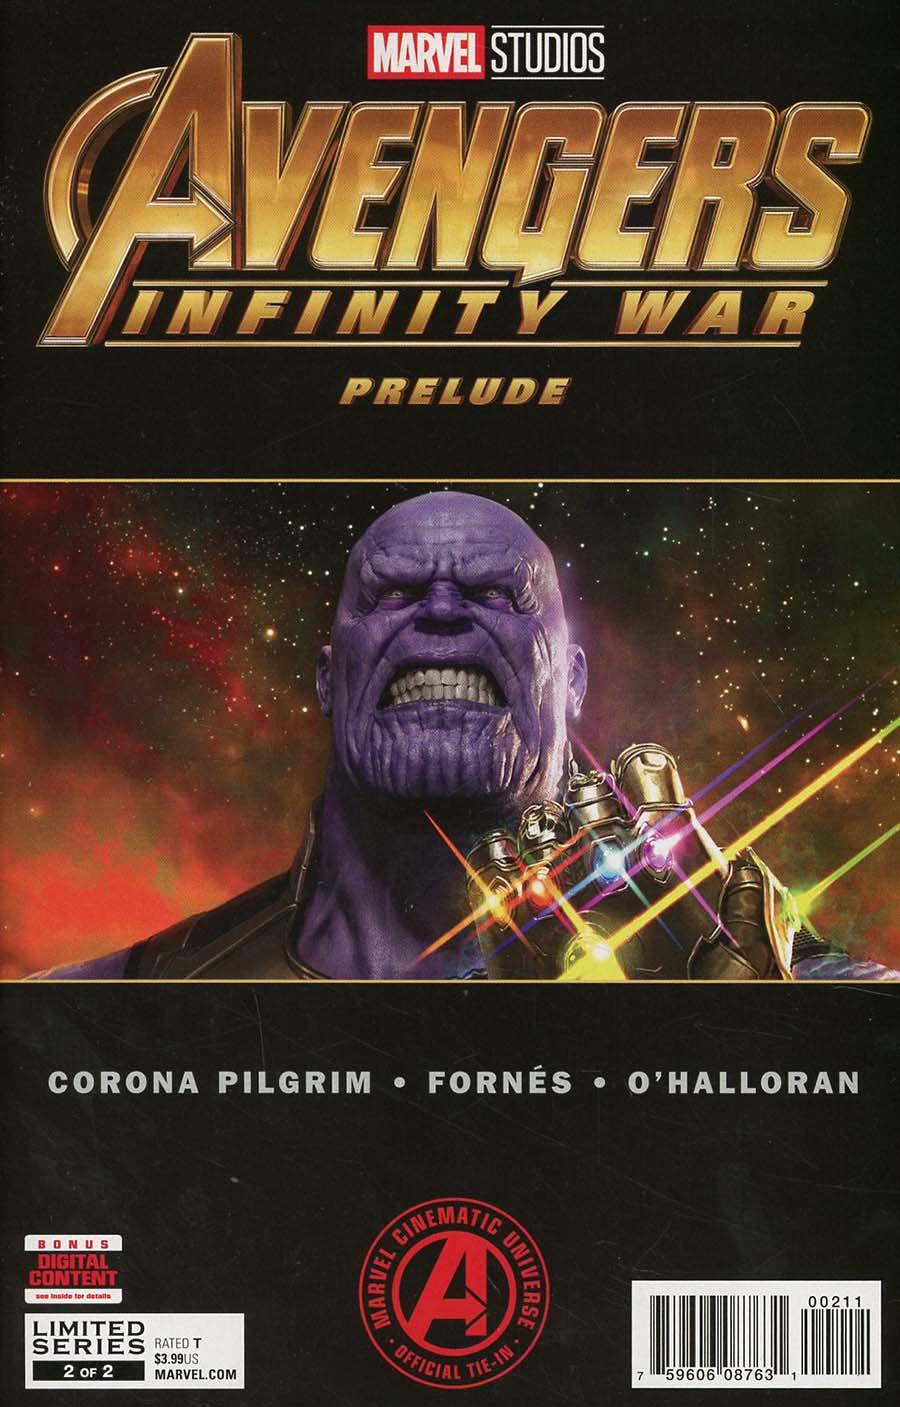 Marvels Avengers Infinity War Prelude #2